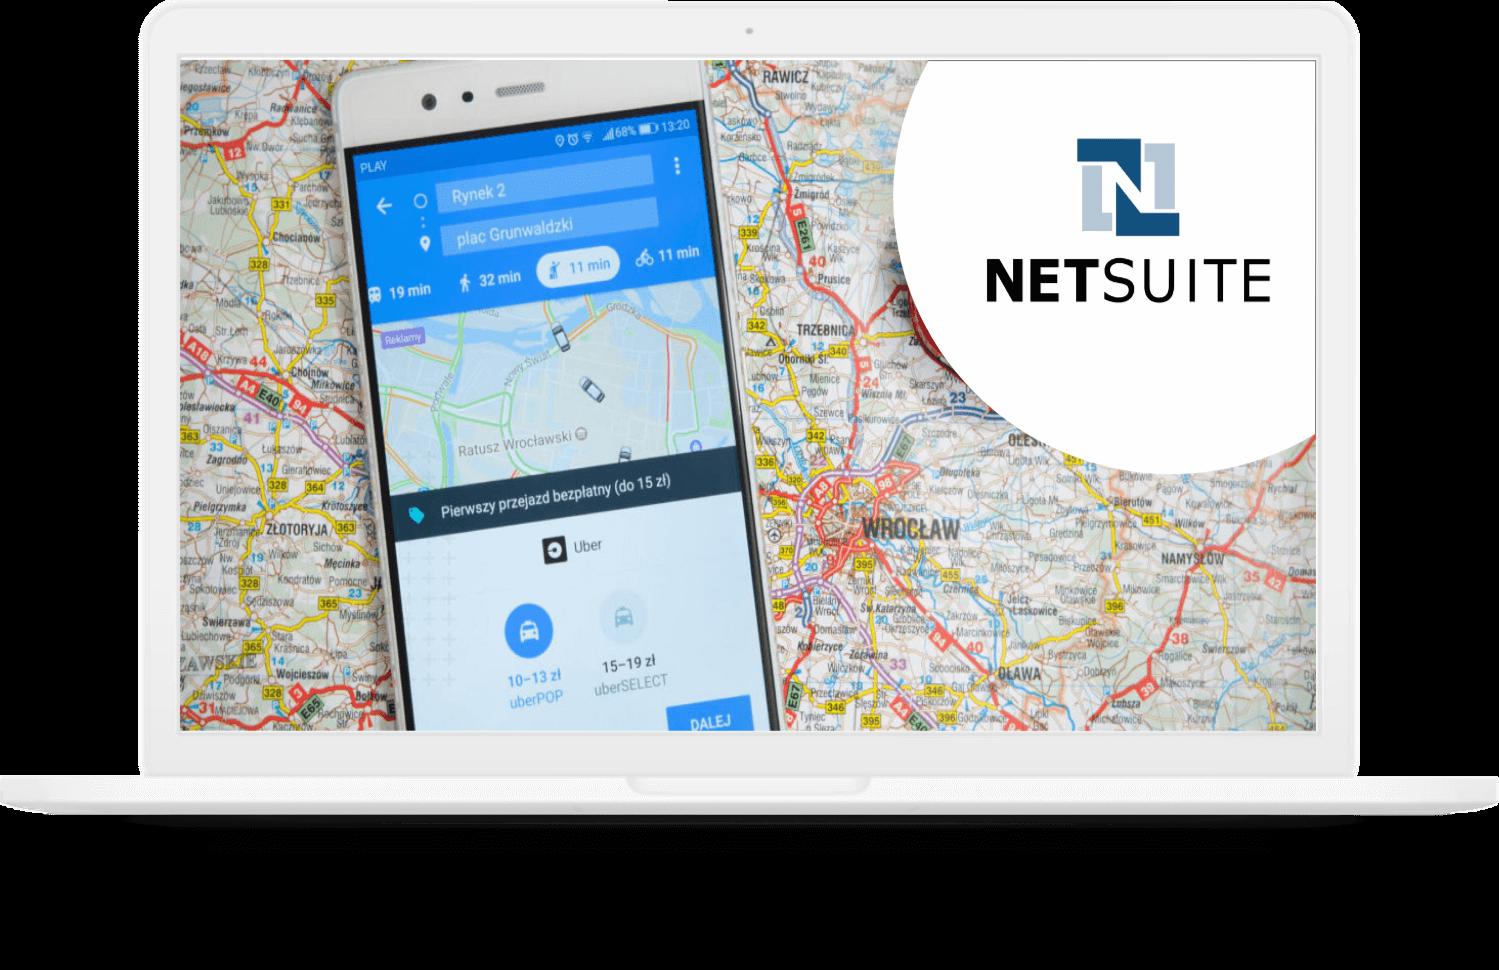 Netsuite Google Map Integration